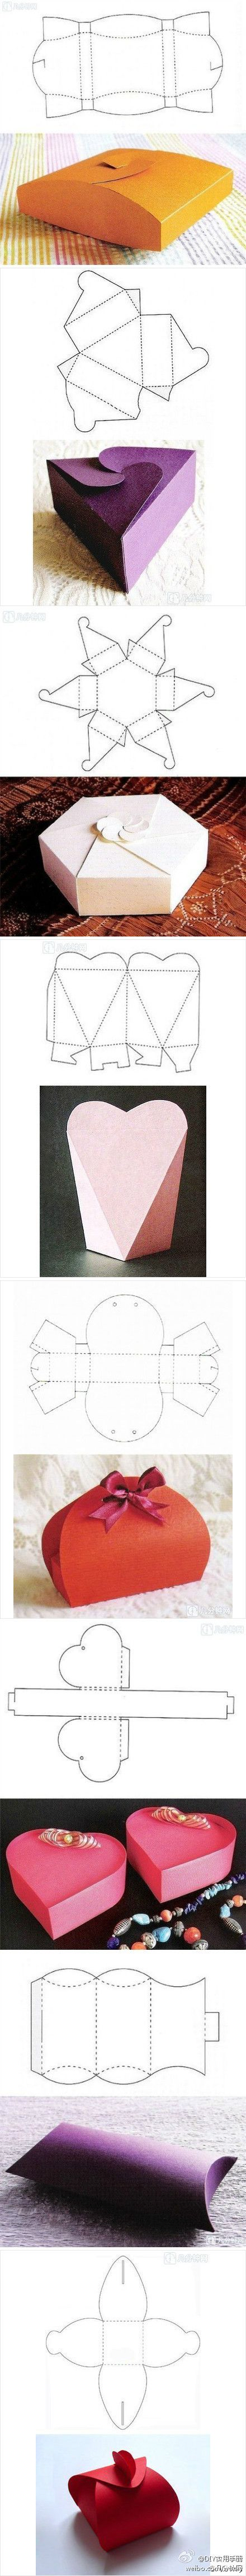 Коробочки из бумаги своими руками шаблоны фото